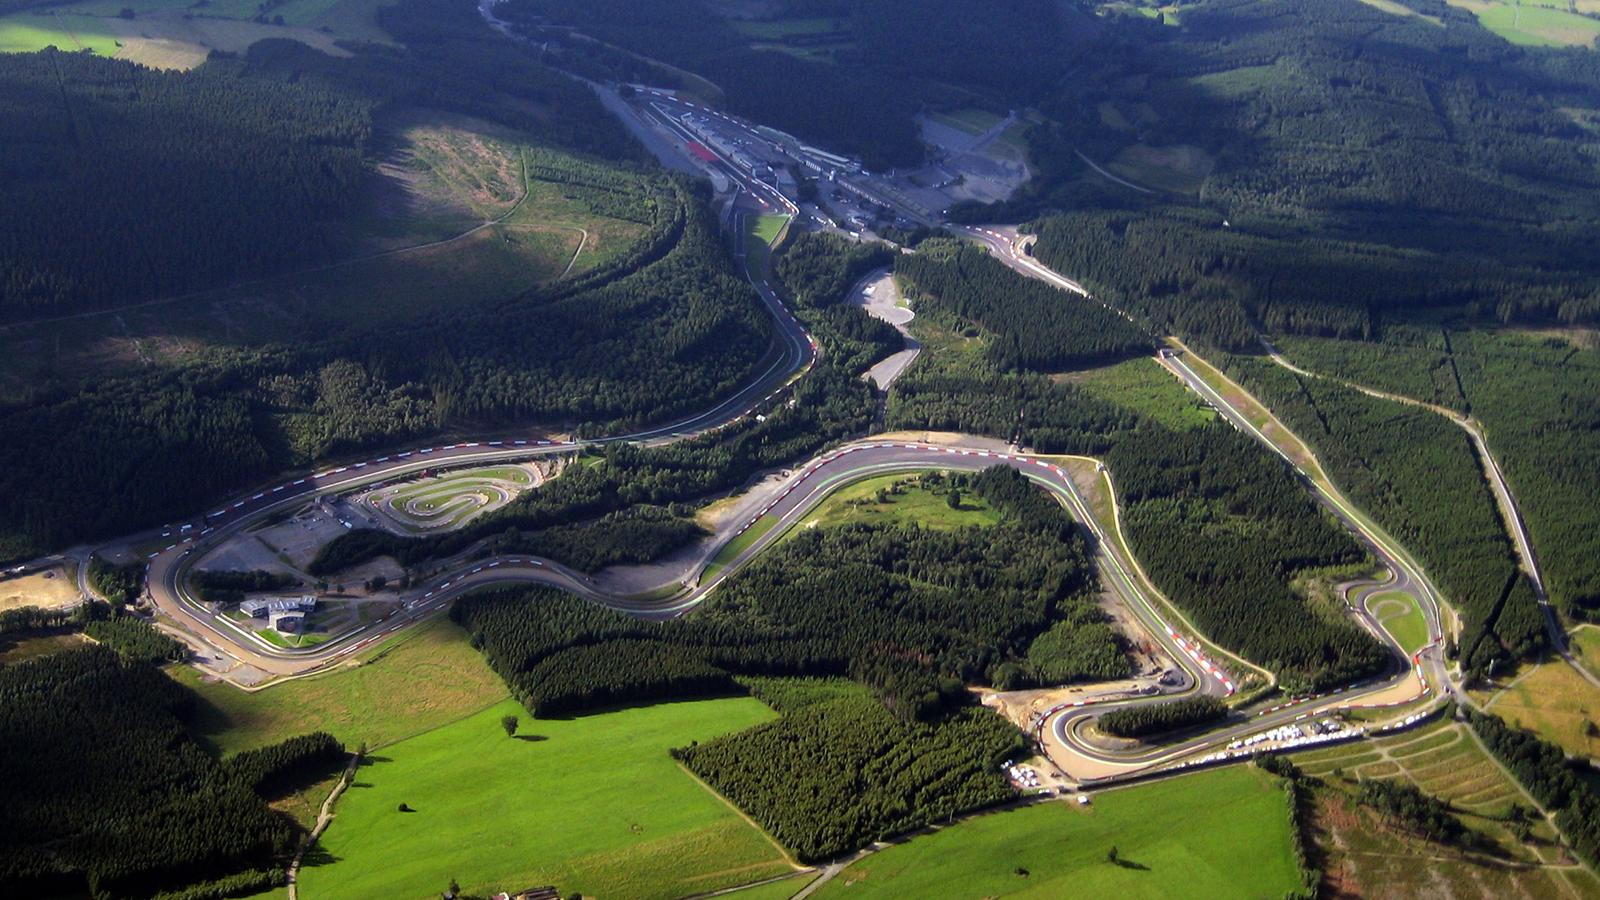 Spa-Francorchamps, Belgium - Round One, 31 May - 2 June 2019, Spa, BelgiumPure McLaren GT Series> Read Race Report